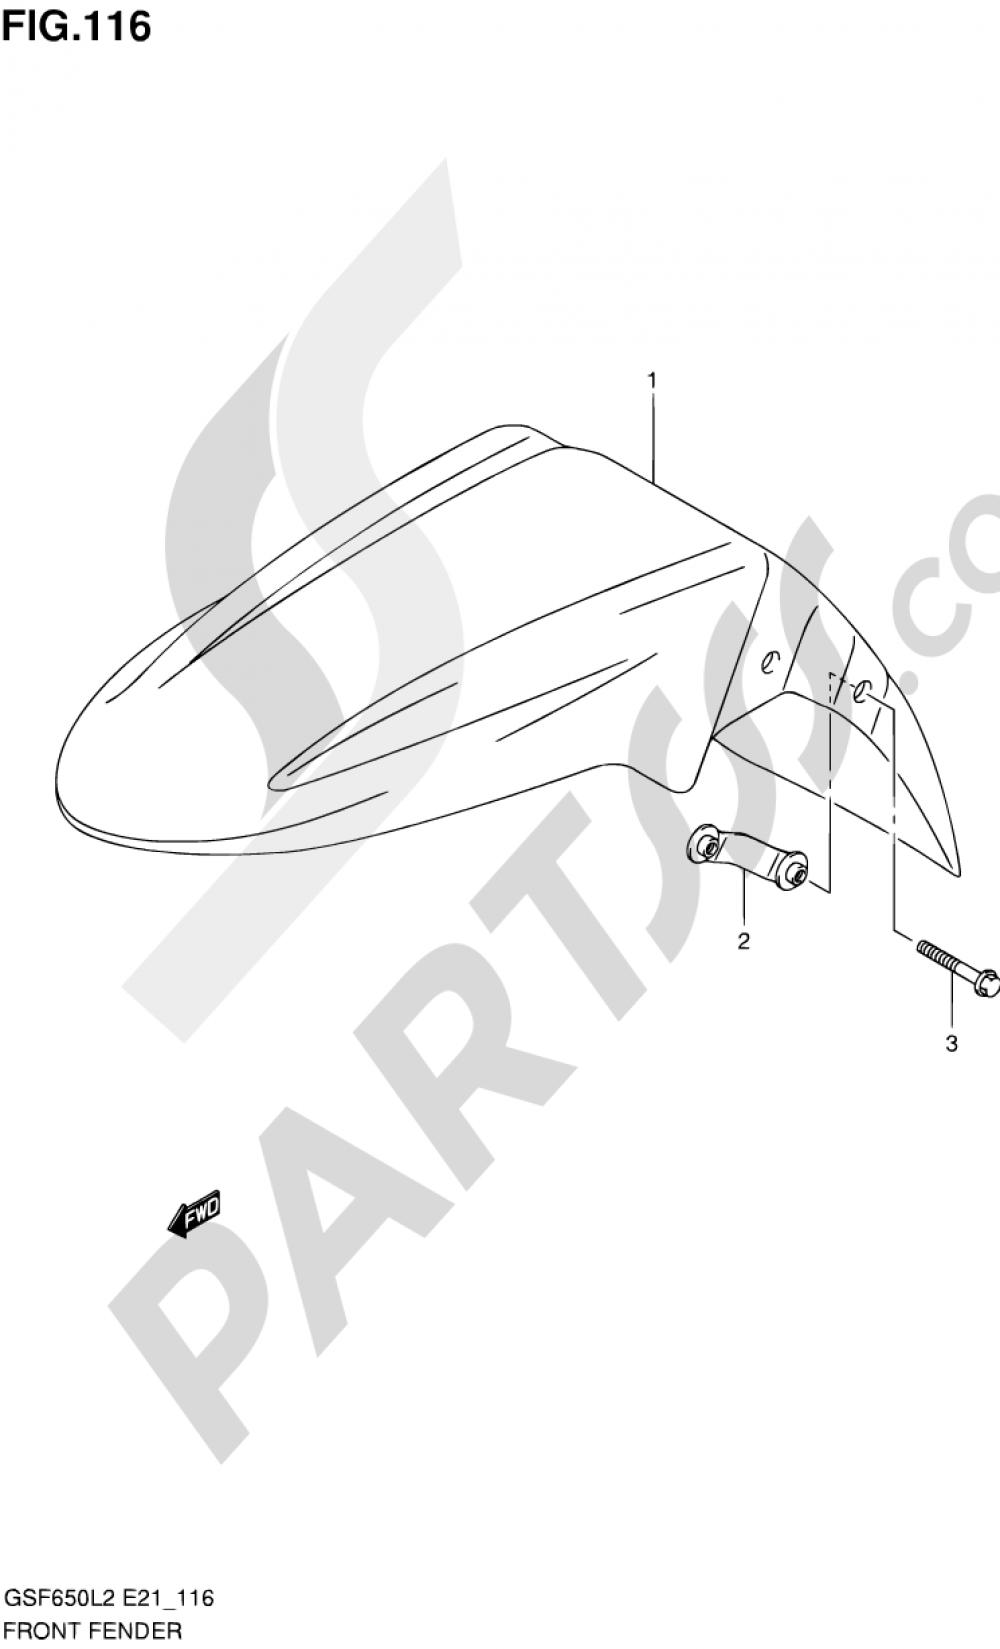 116 - FRONT FENDER (GSF650SUL2 E21) Suzuki BANDIT GSF650 2012